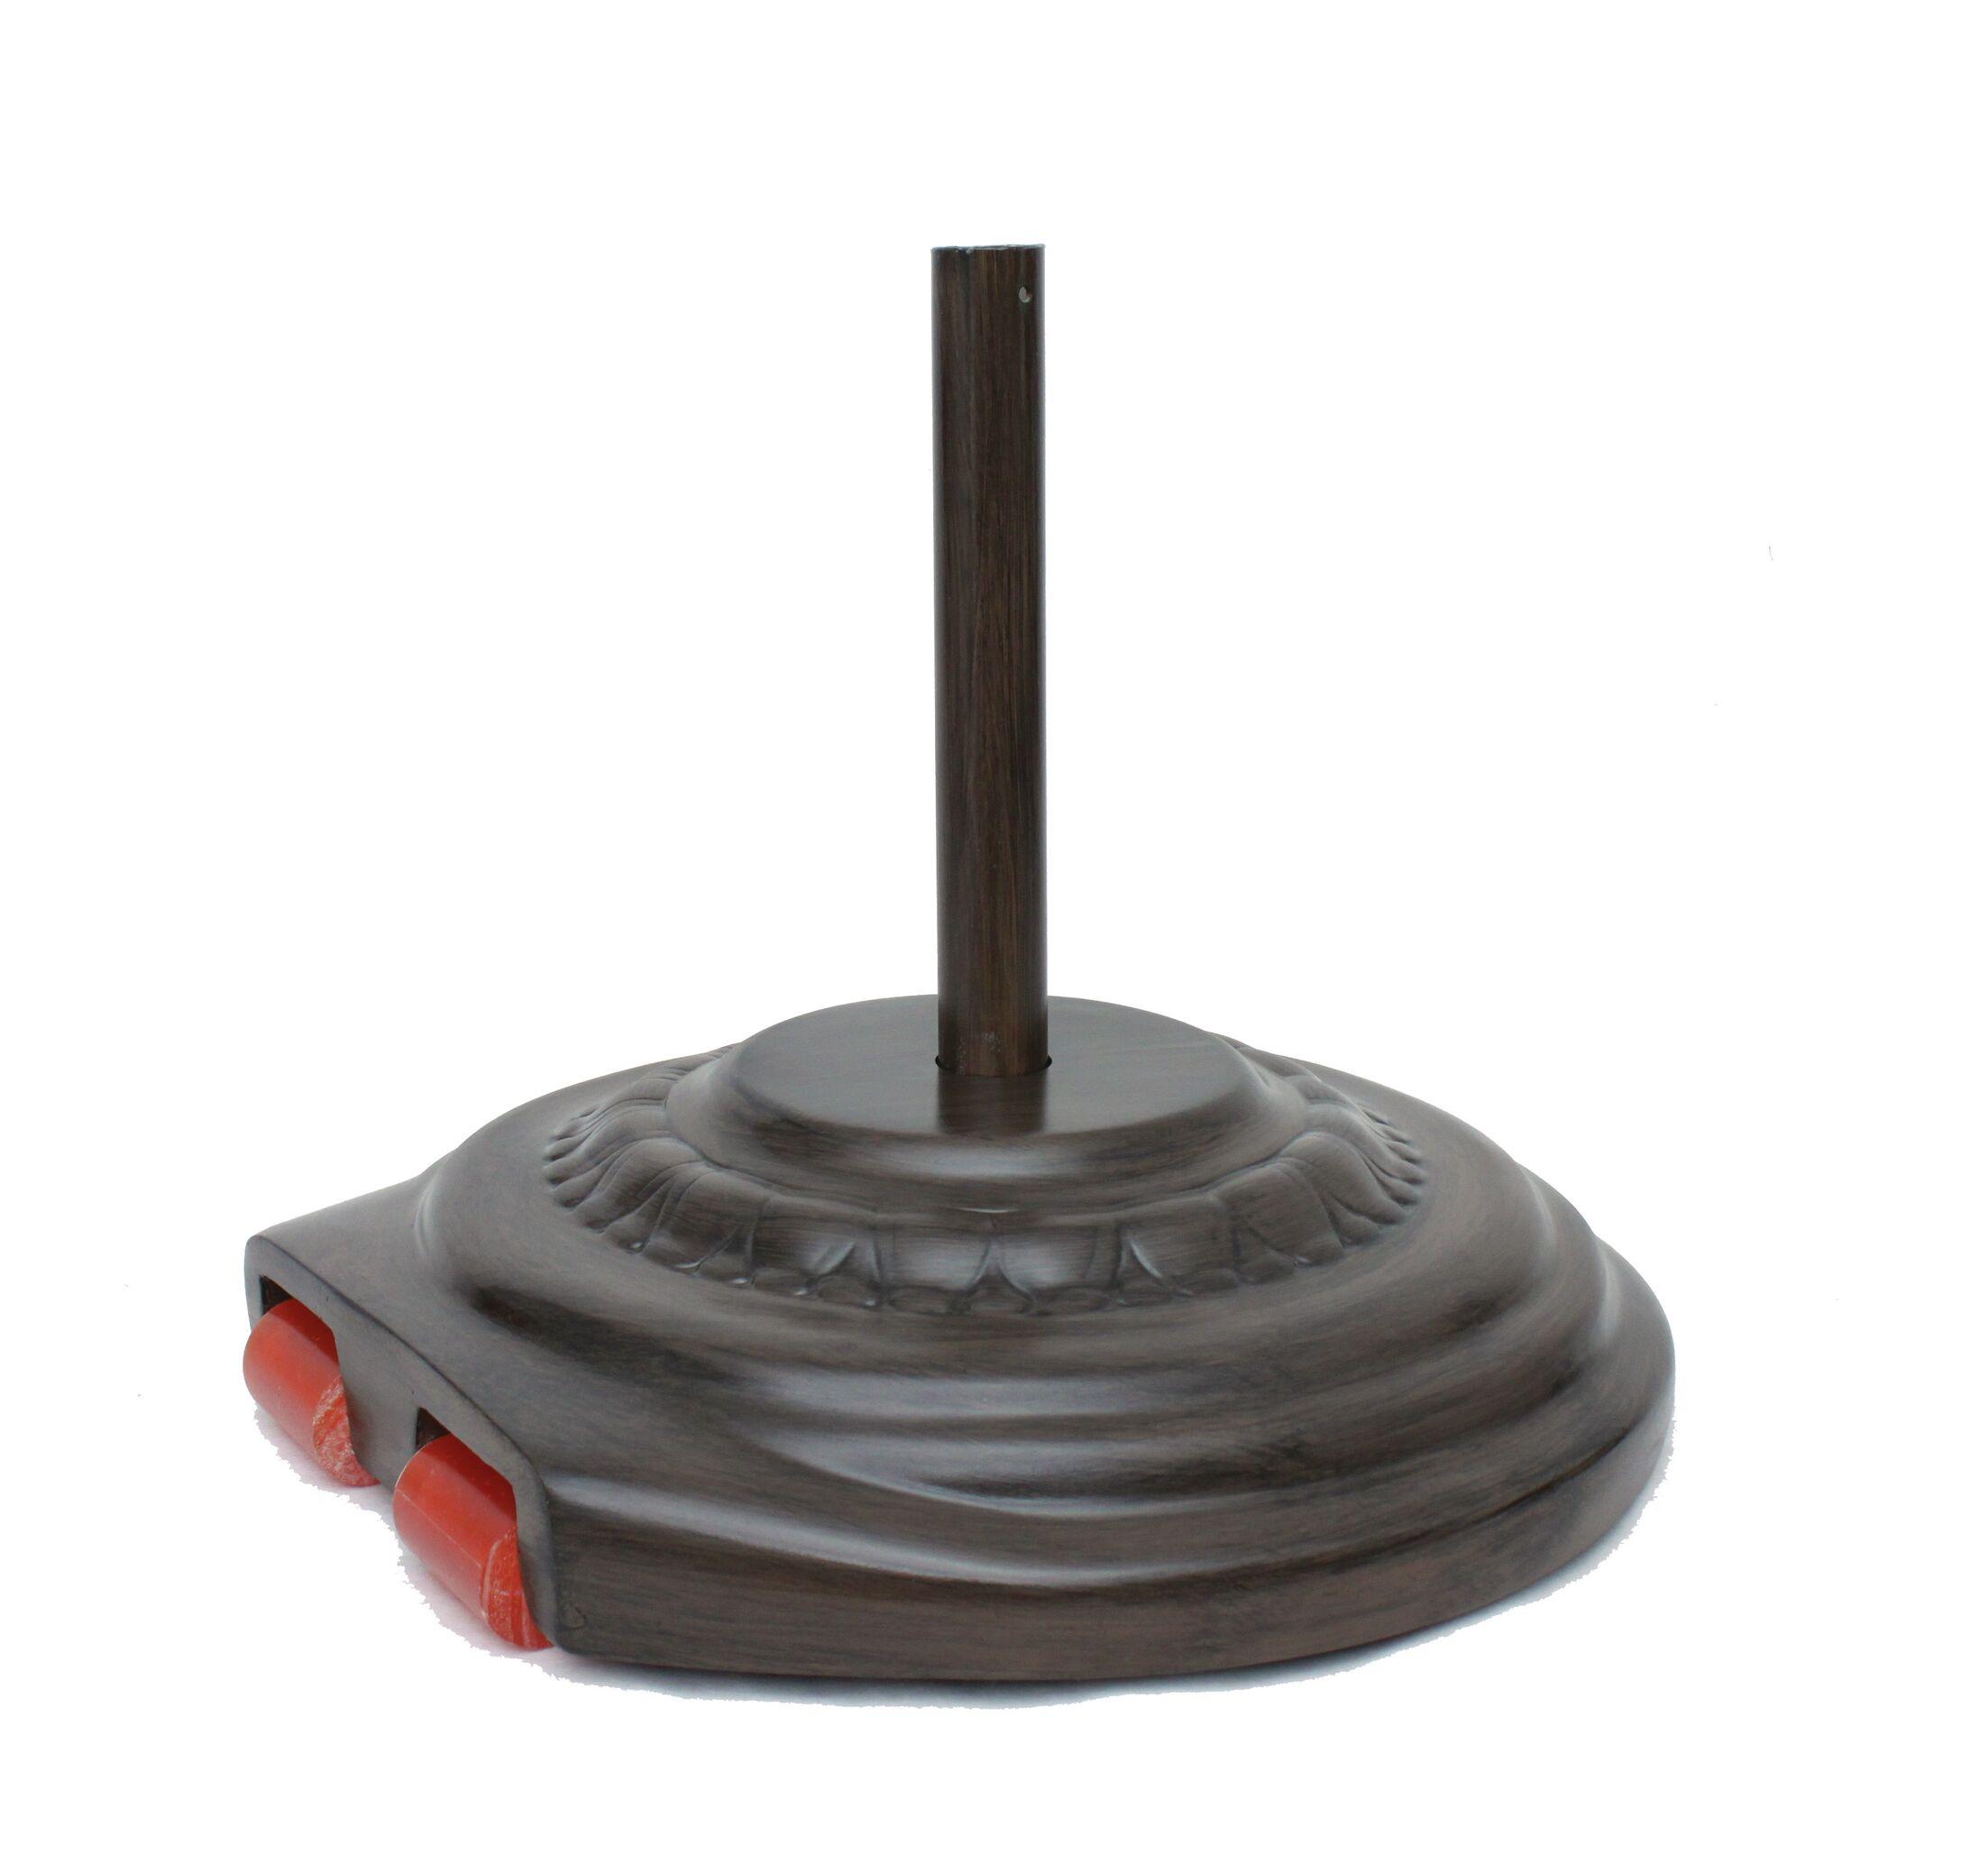 Fiberglass Free Standing Umbrella Base Weight: 150, Color: Chestnut